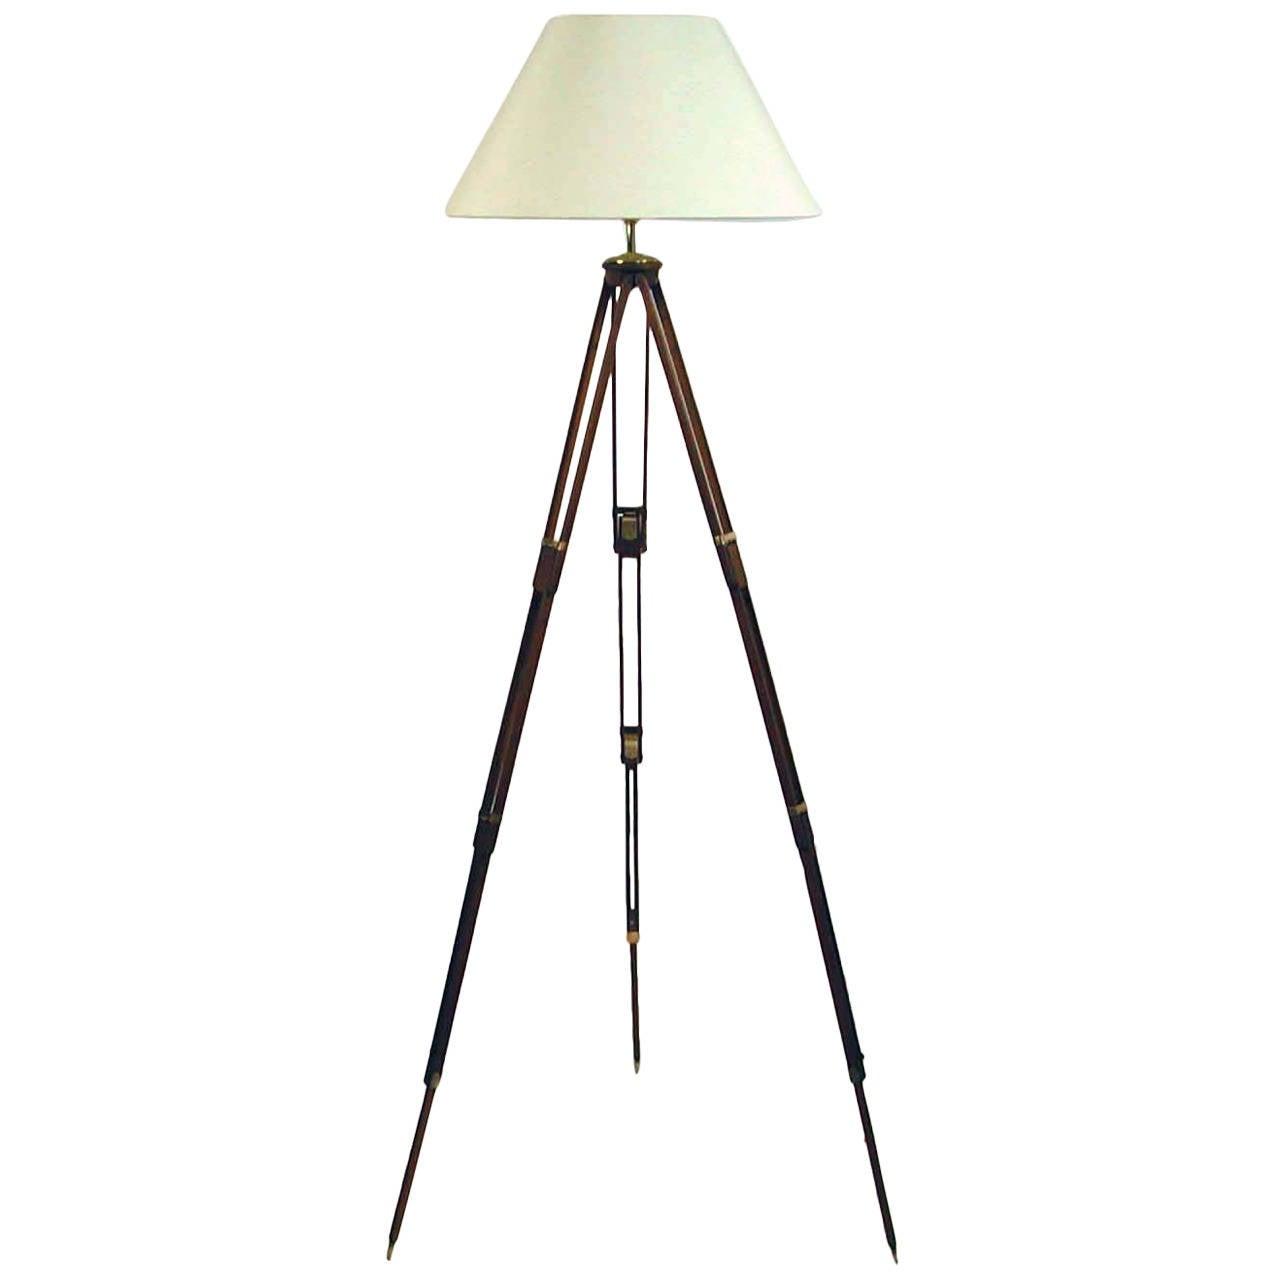 Vintage wooden tripod floor lamp at 1stdibs for Antique wooden floor lamp base